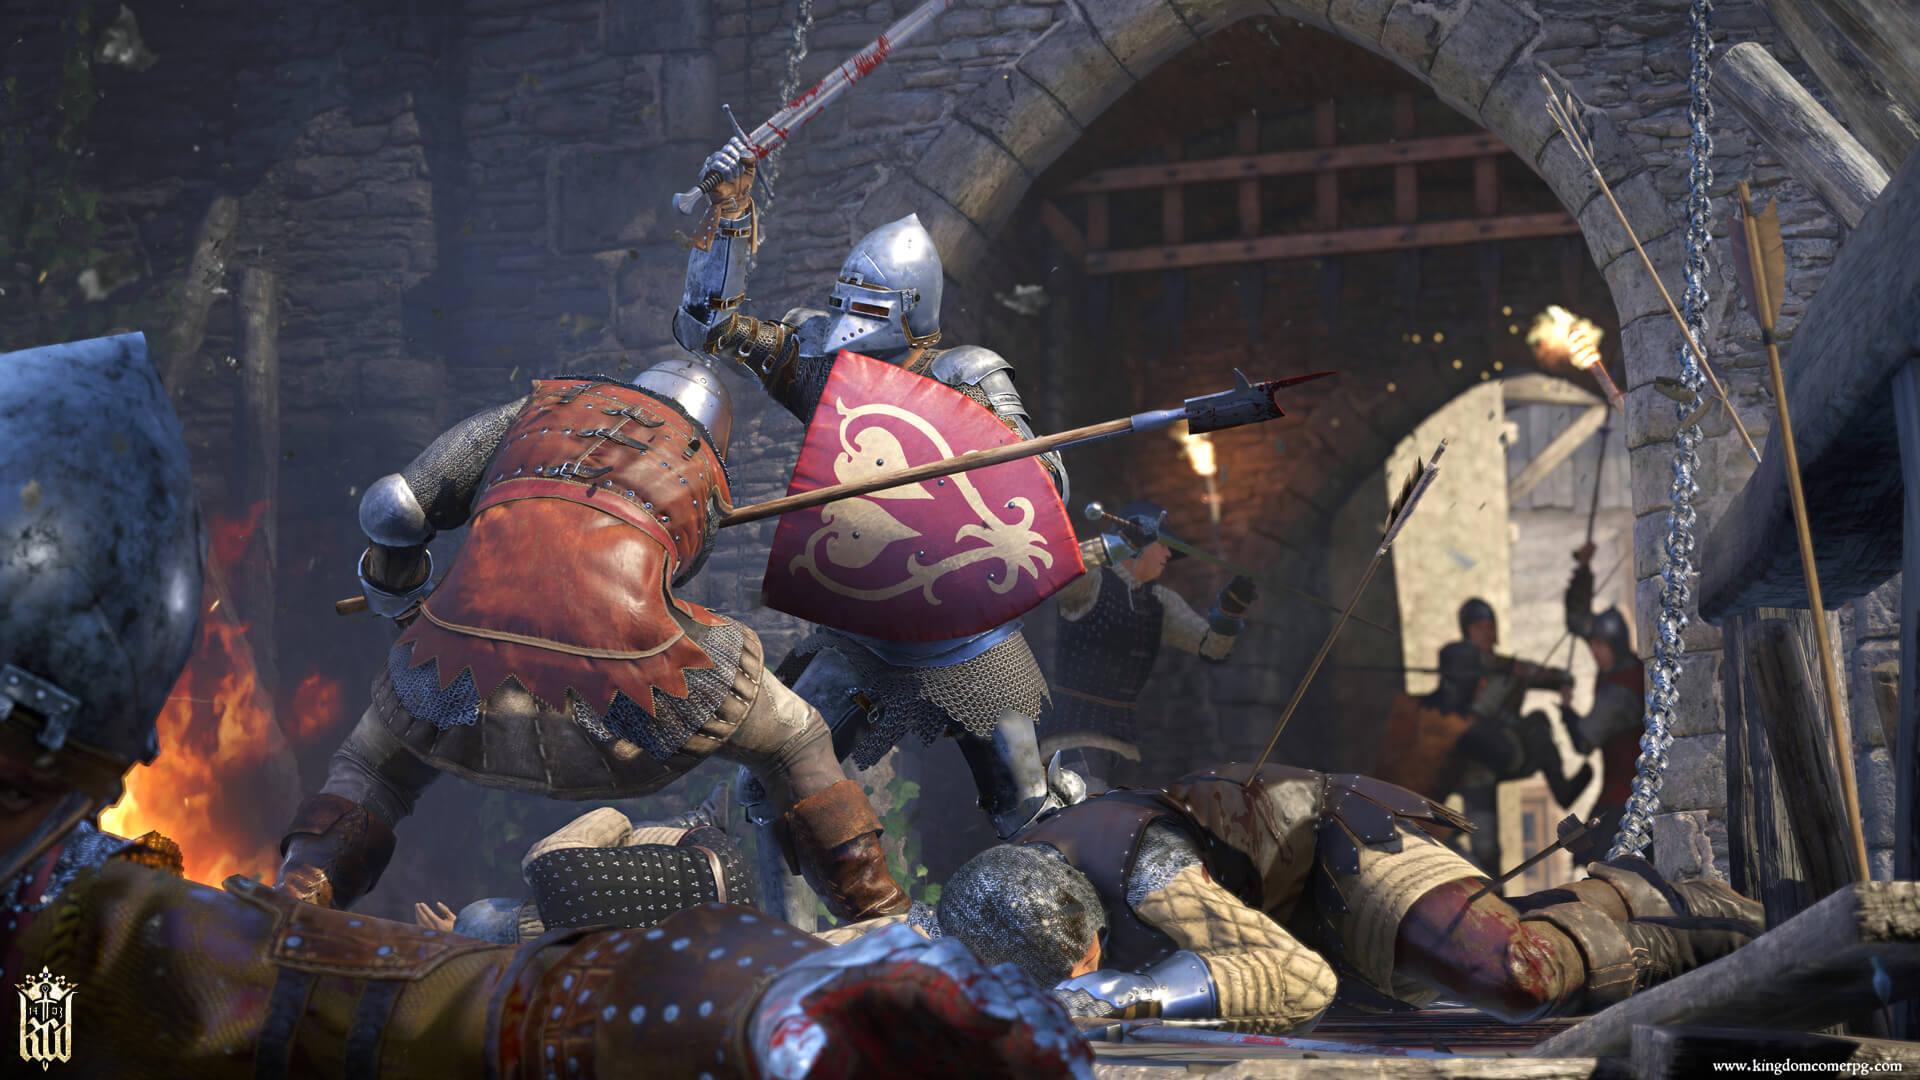 Kingdom Come deliverance oyun early access erken erişim